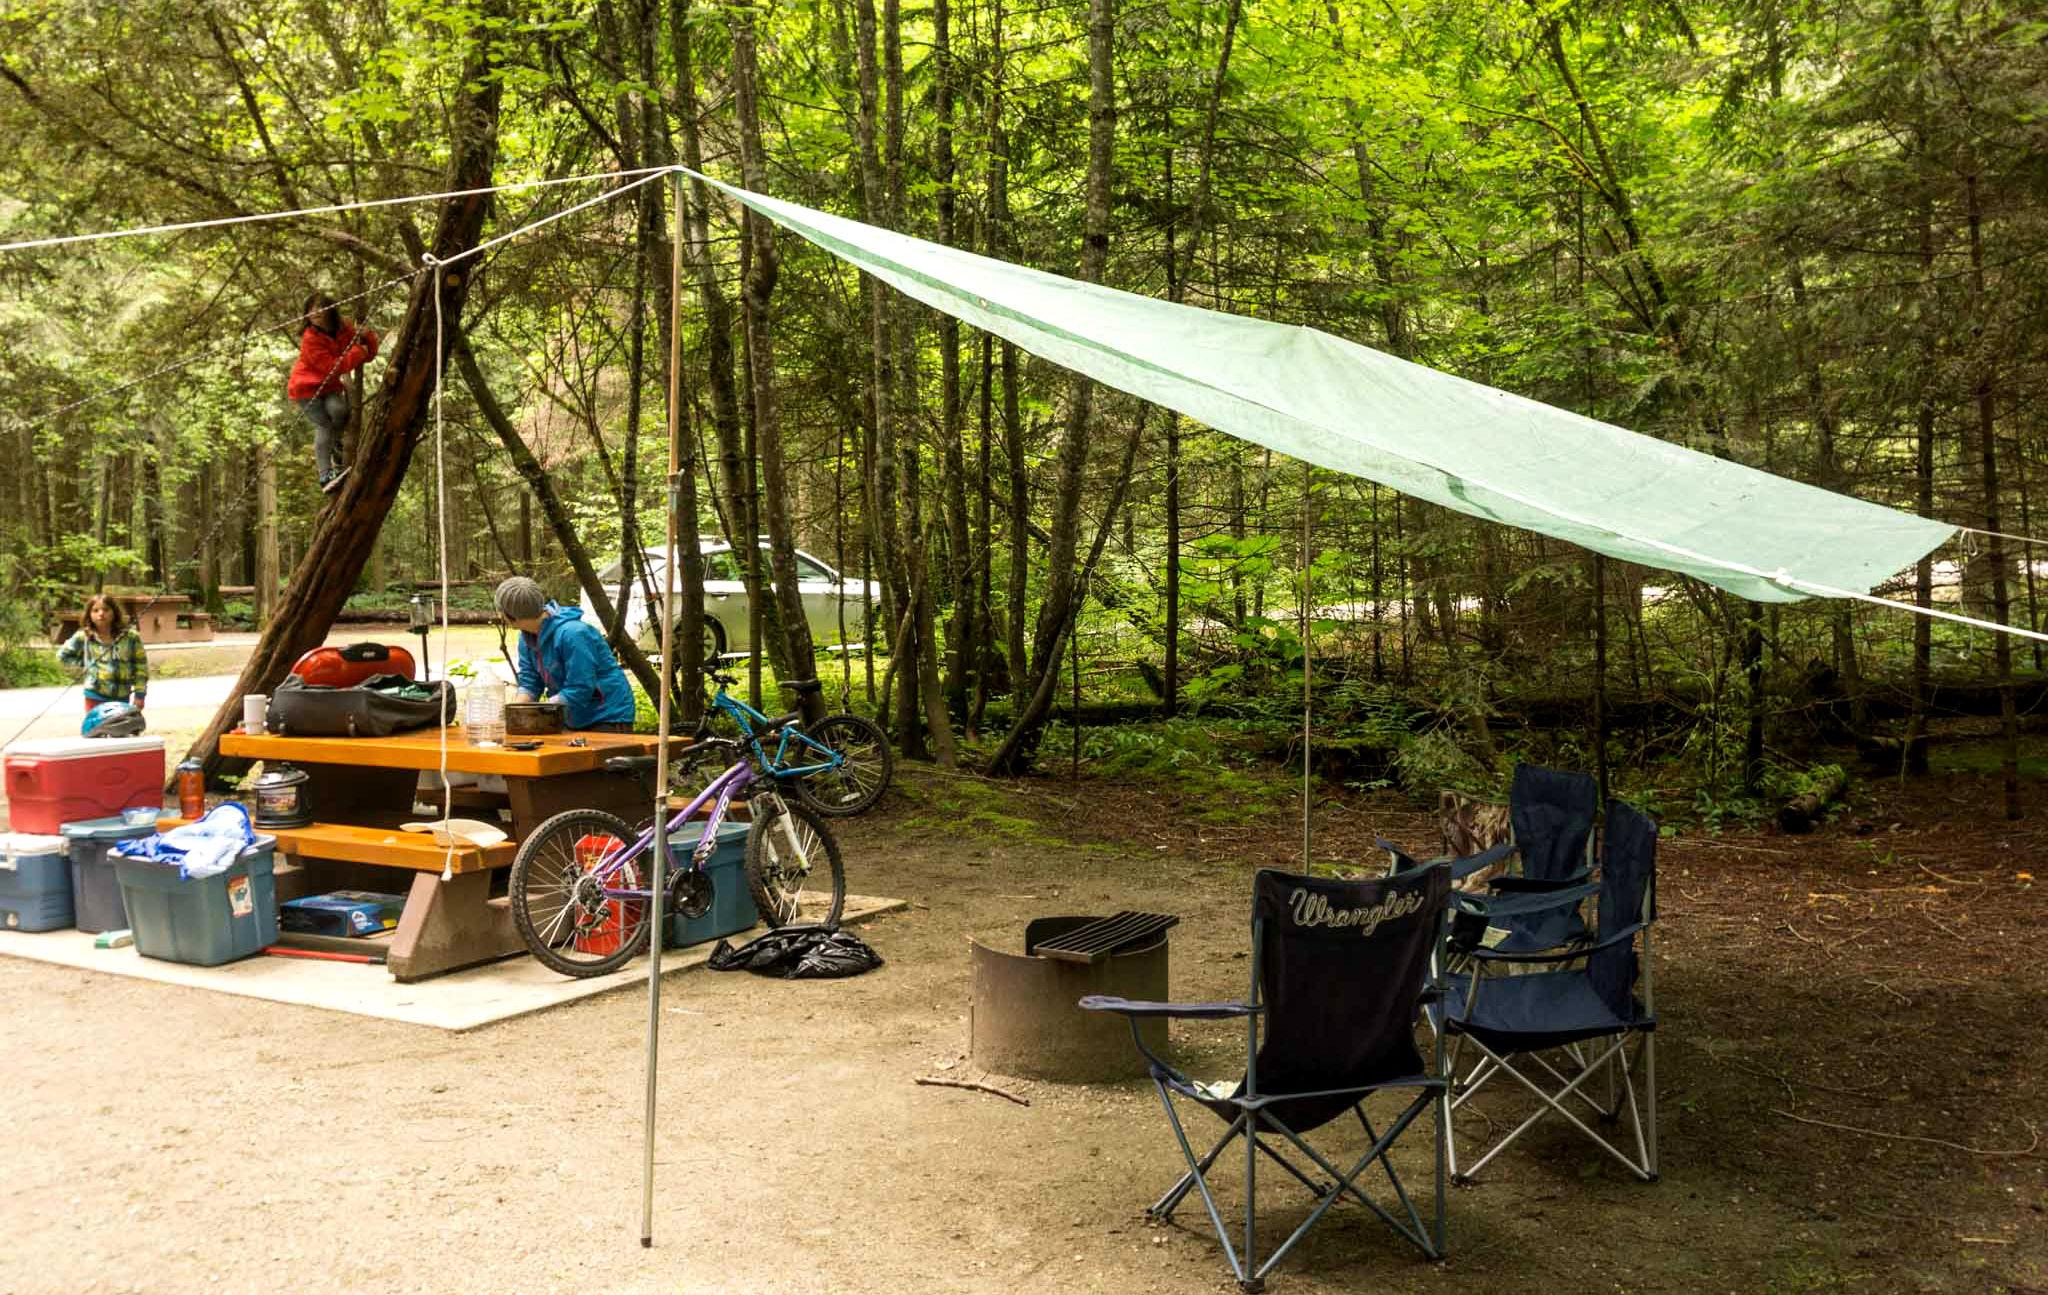 Camp tarp